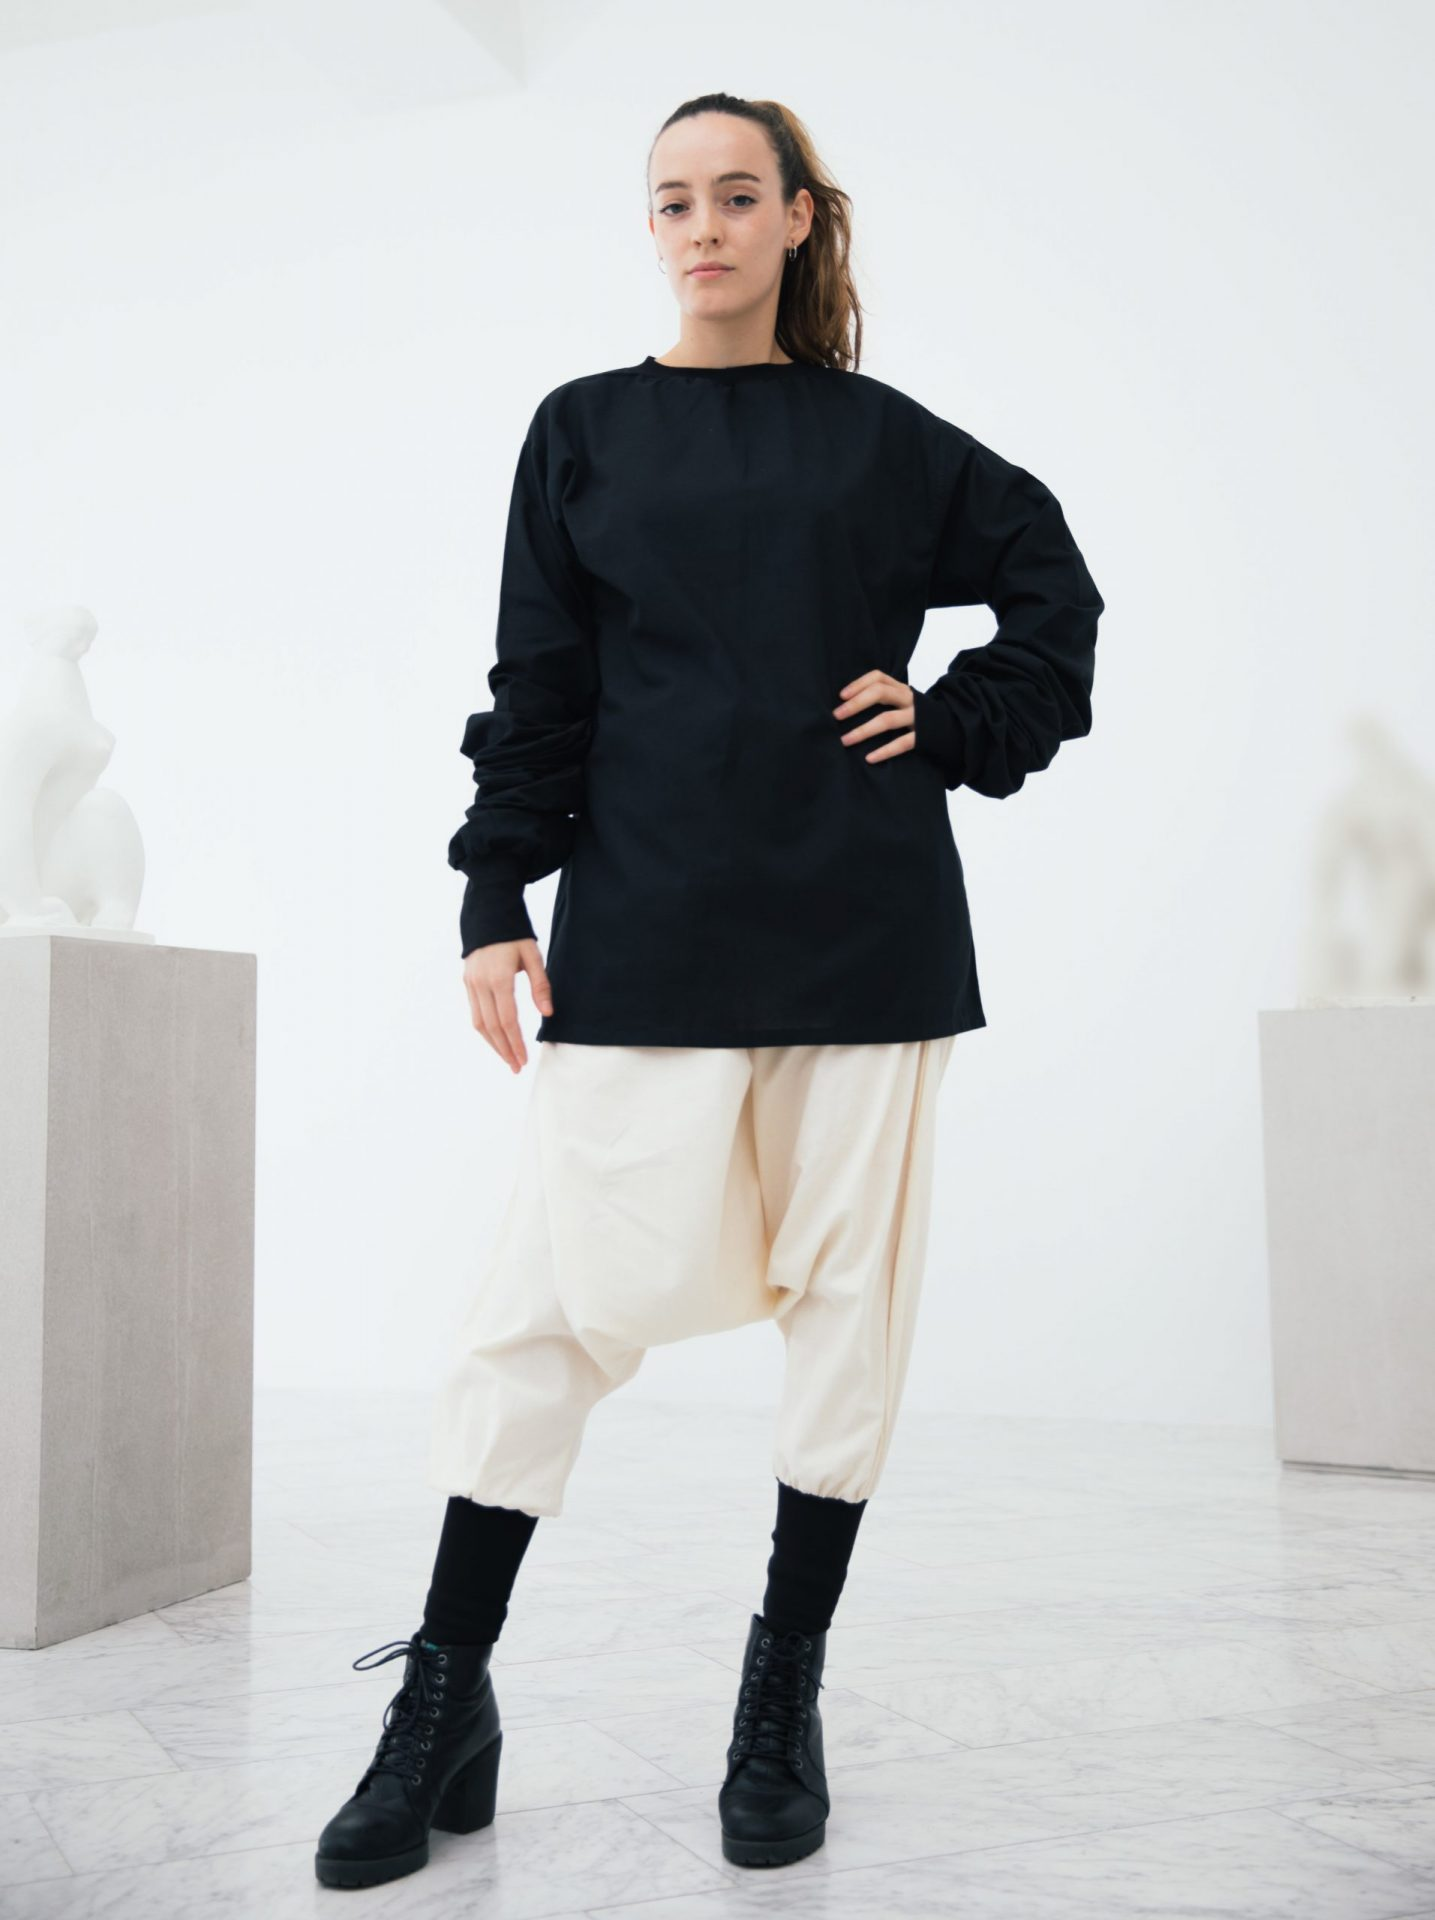 Unisex fashion tailored in Reykjavik - Svartbysvart originals Long Sleeve Top